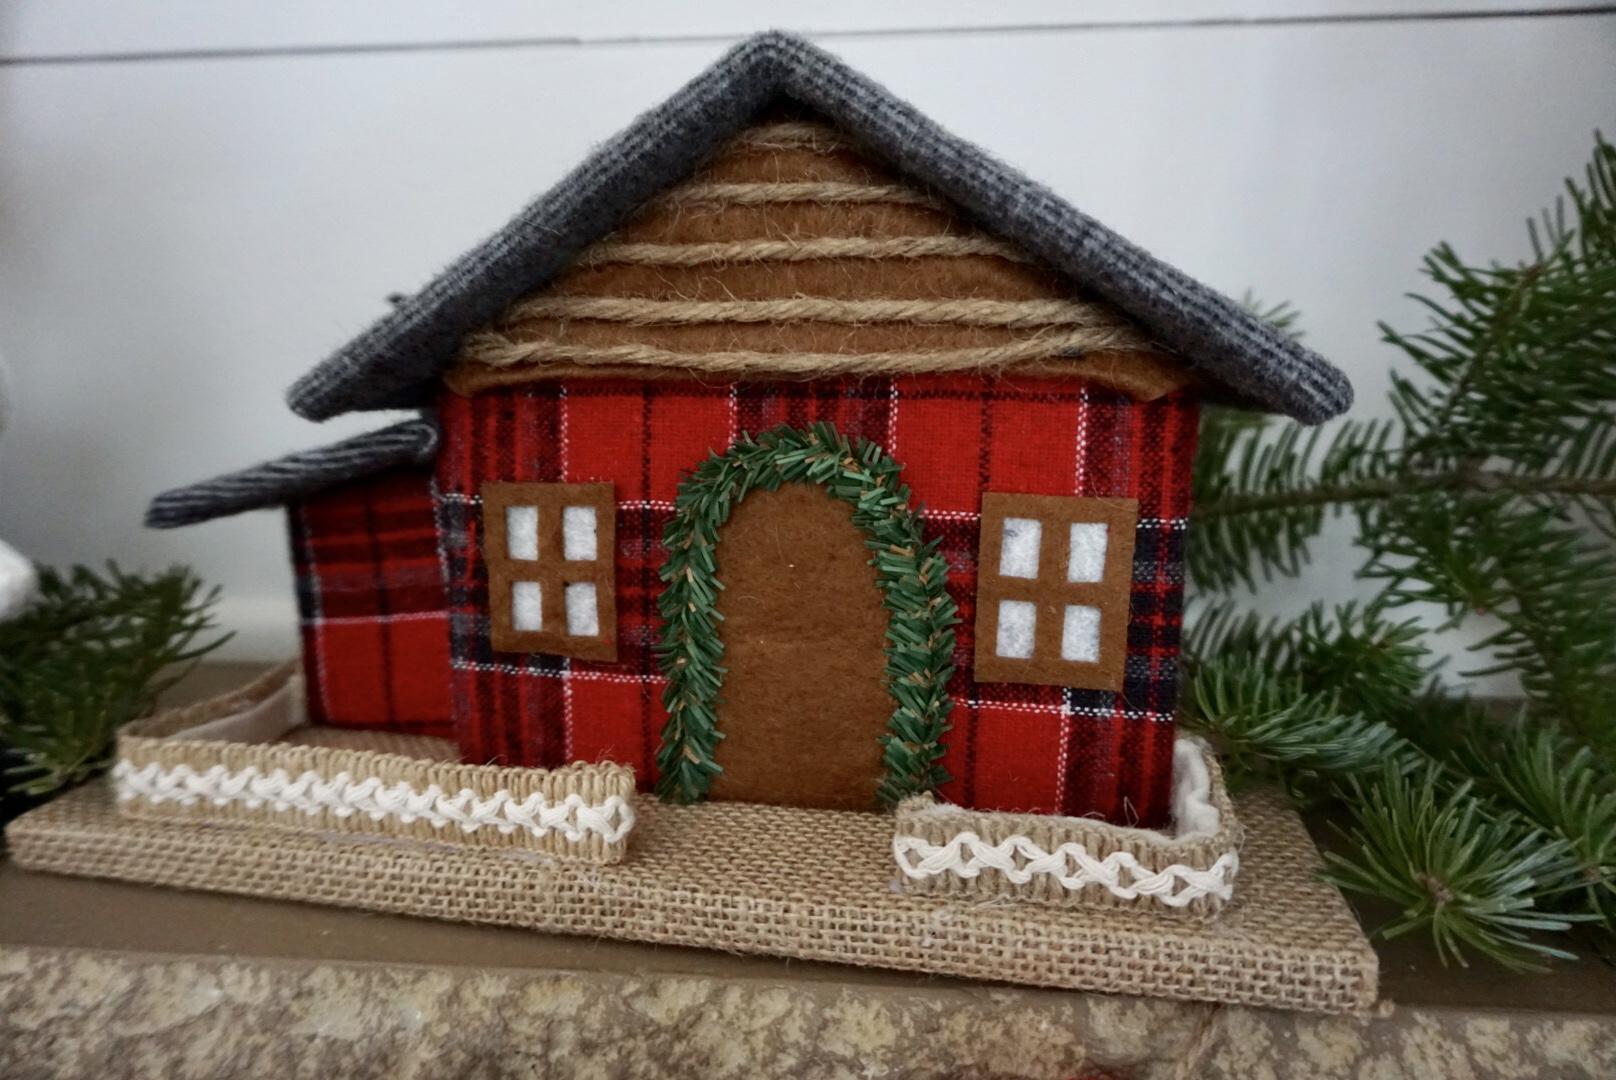 Plaid Christmas house from Walmart.